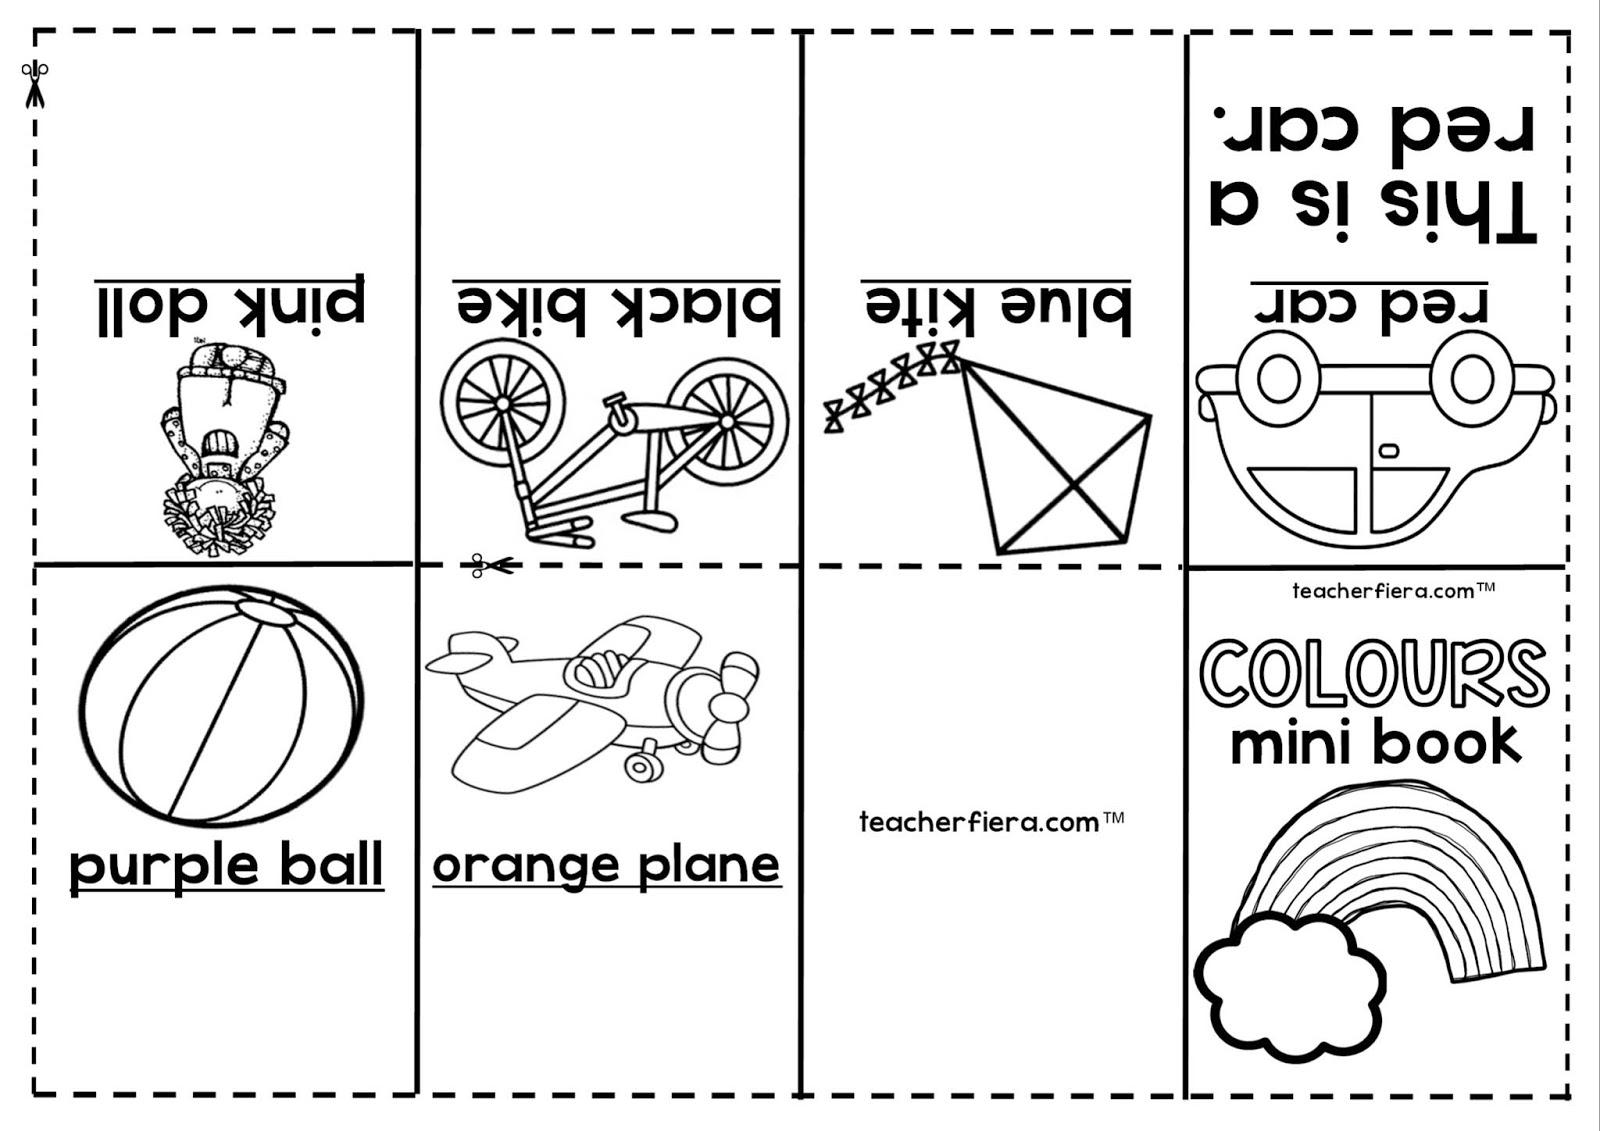 Teacherfiera Year 1 Amp Year 2 Mini Books Compilation